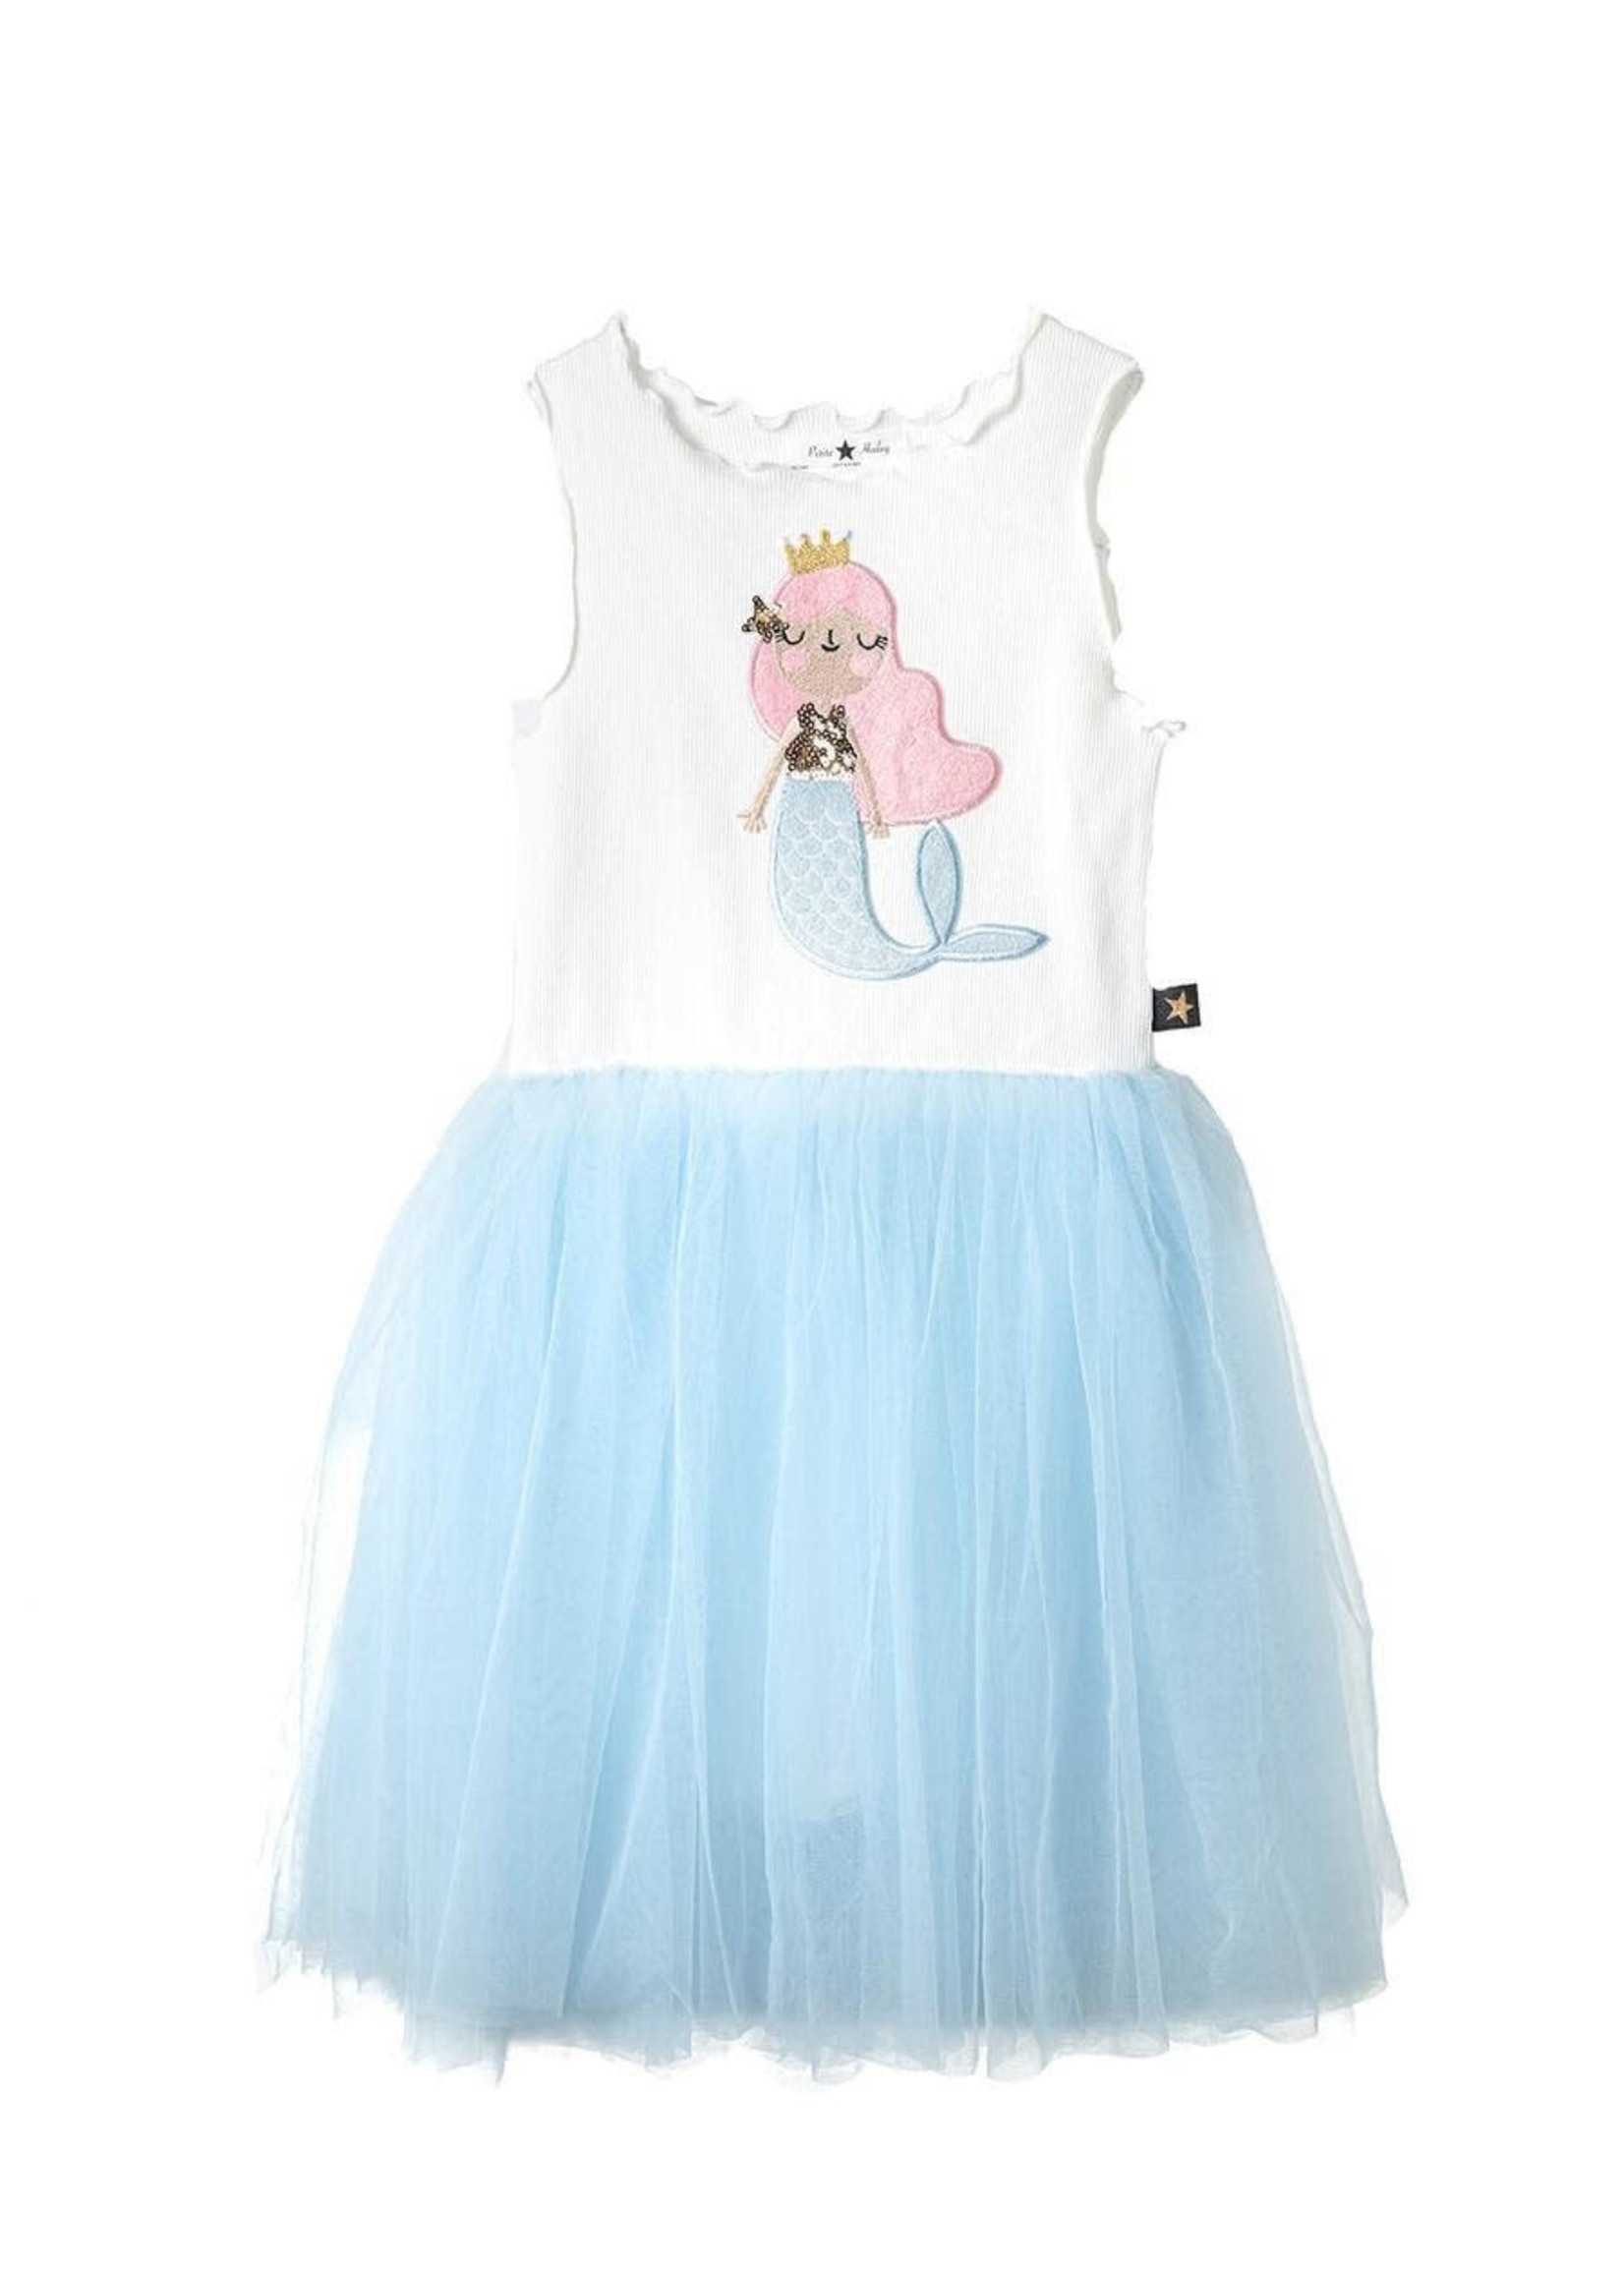 Petite Hailey PH Mermaid Tutu Dress